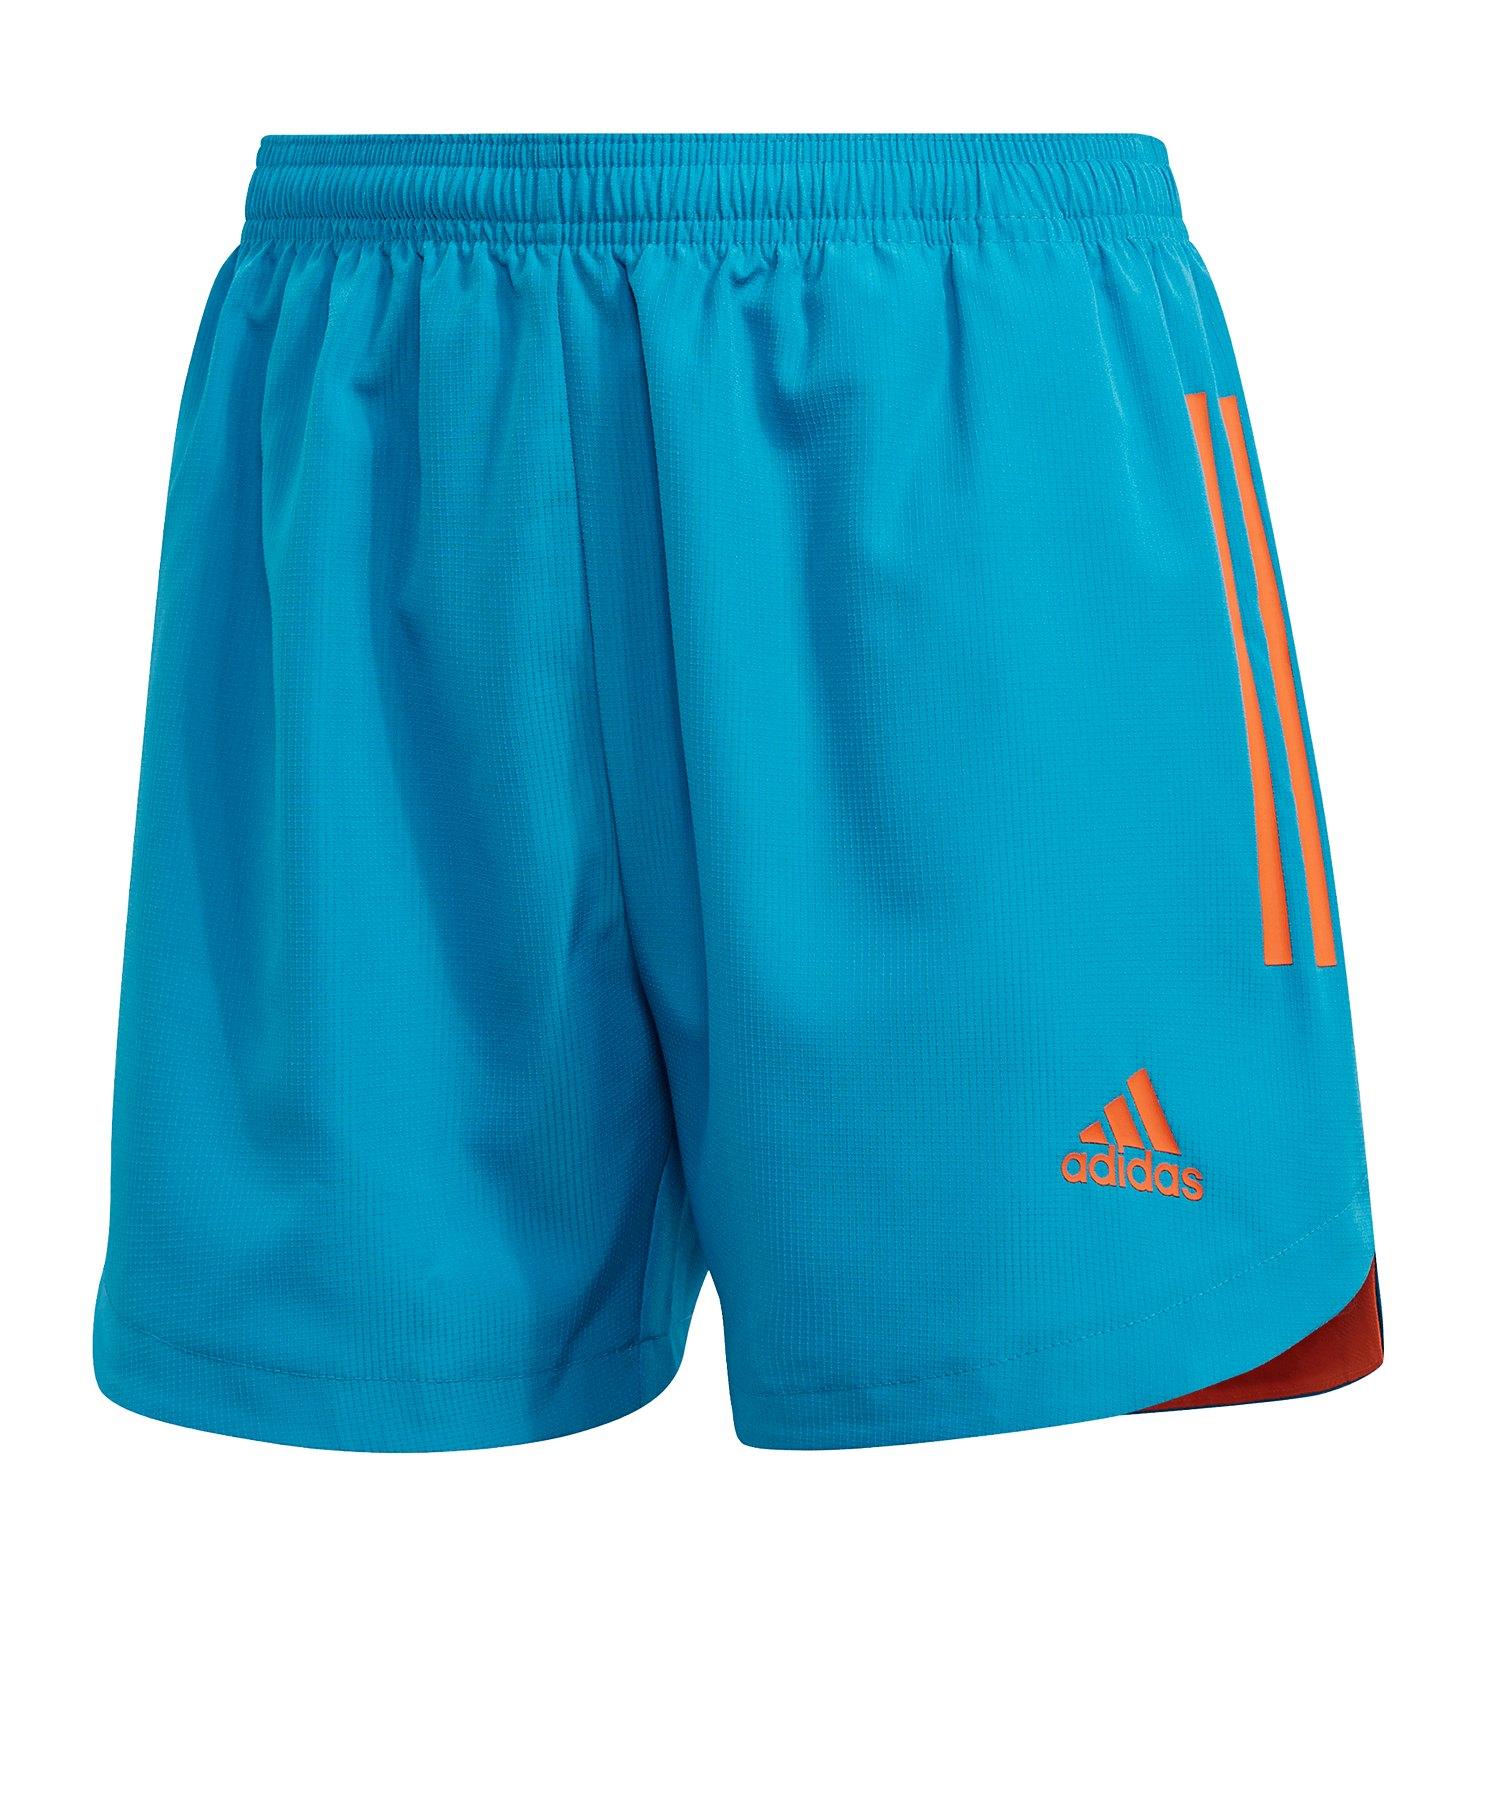 adidas Condivo 20 PB Short lang Damen Blau Orange - blau